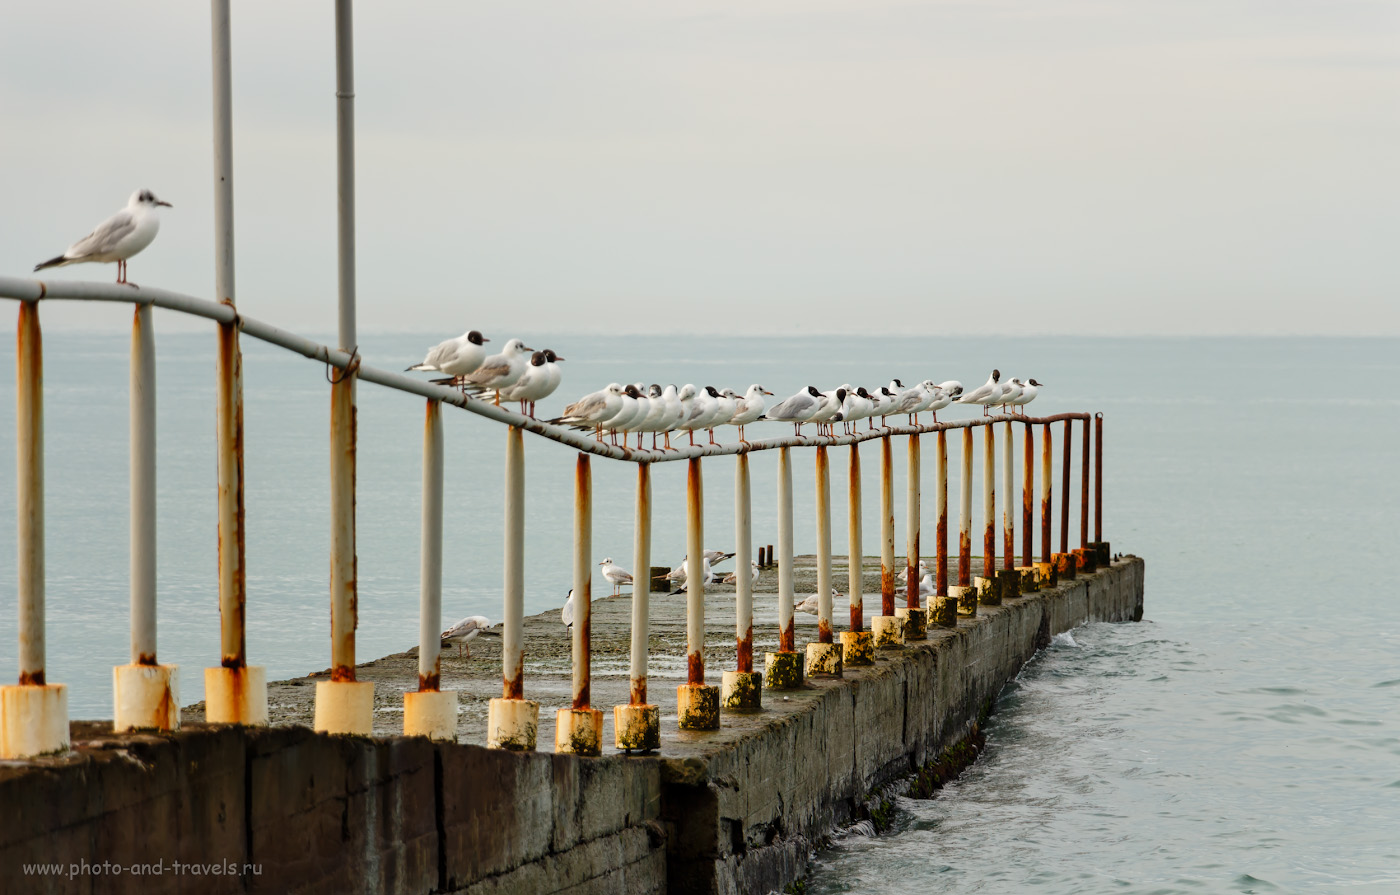 Снимок 3. Голодные чайки на волнорезах в Сочи. Утром на море в марте. 1/320, f/5.6, ISO 100, 135мм.